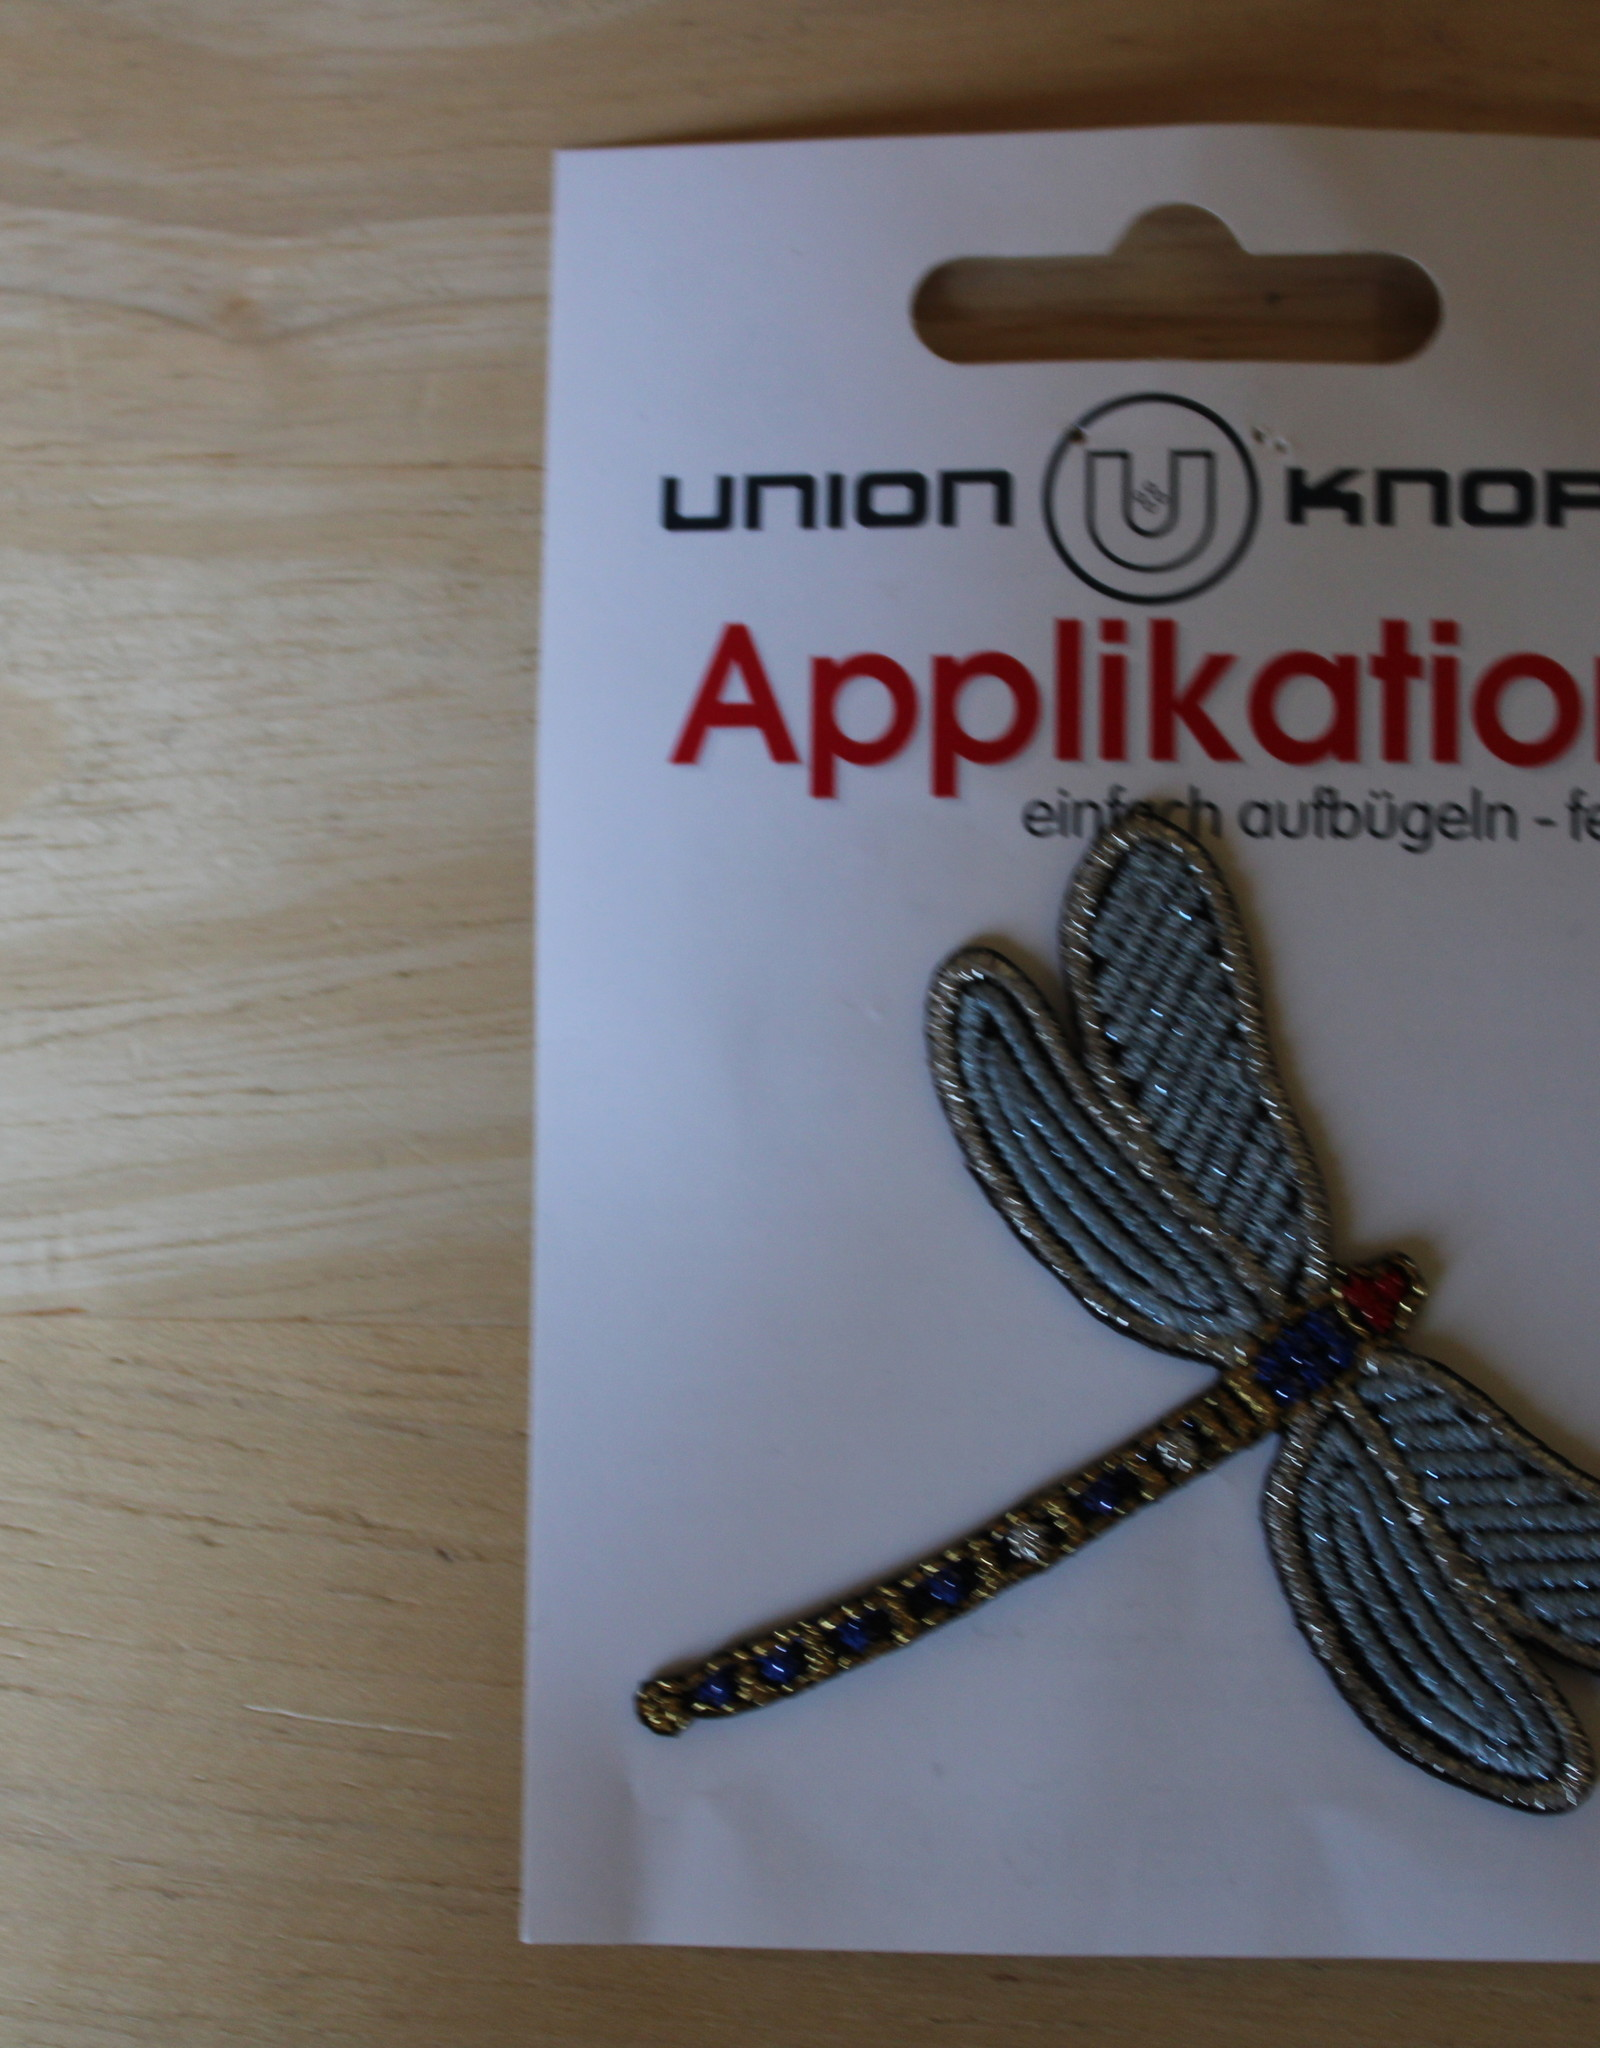 Union Knopf applicatie libel